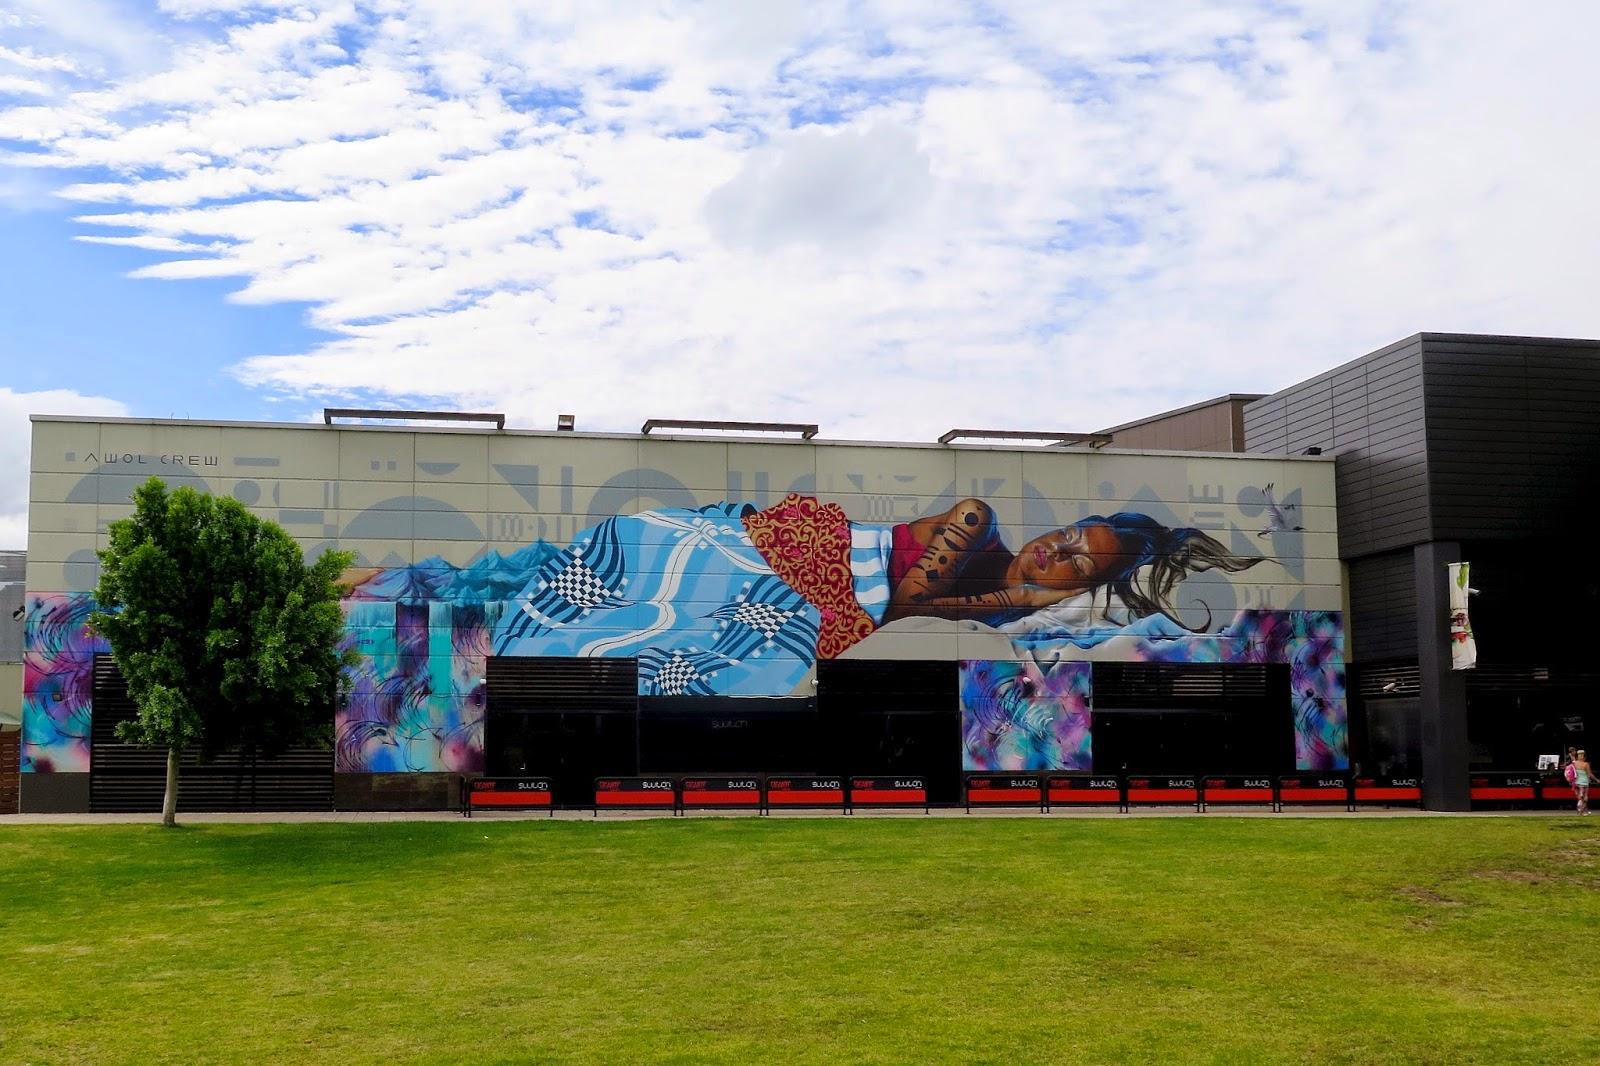 Awol crew paints a new mural in melbourne australia for Australian mural